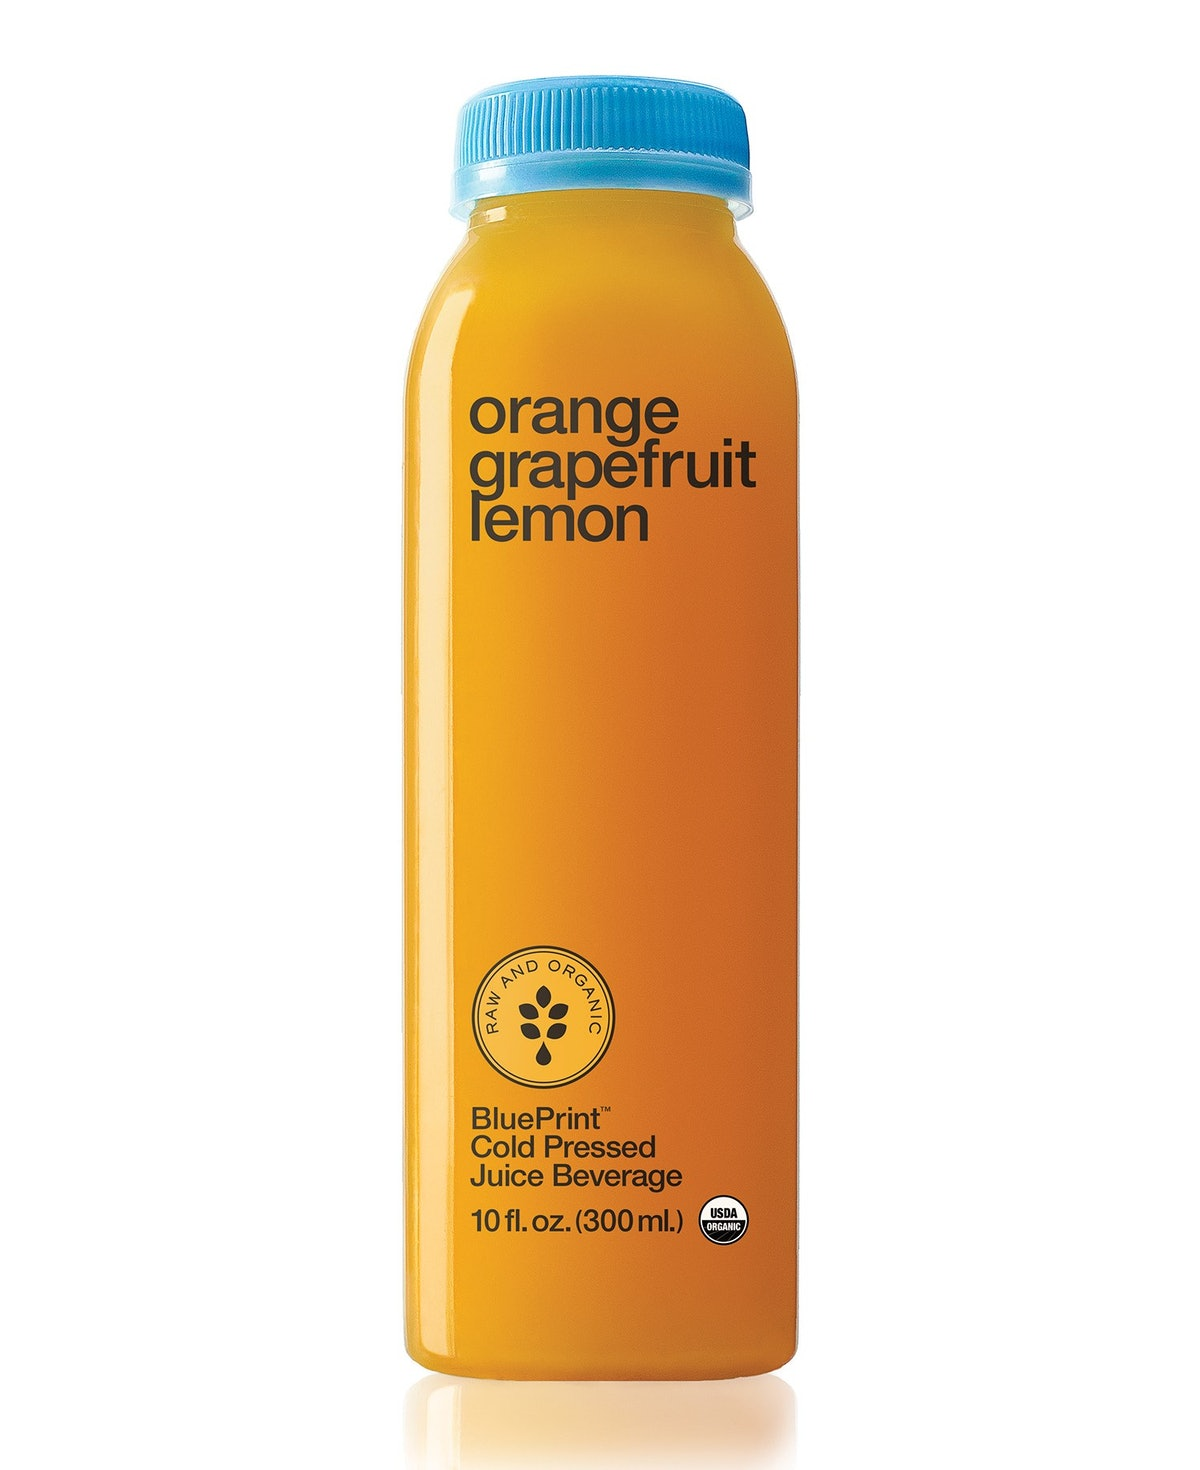 bear-BluPrint-cold-pressed-juice